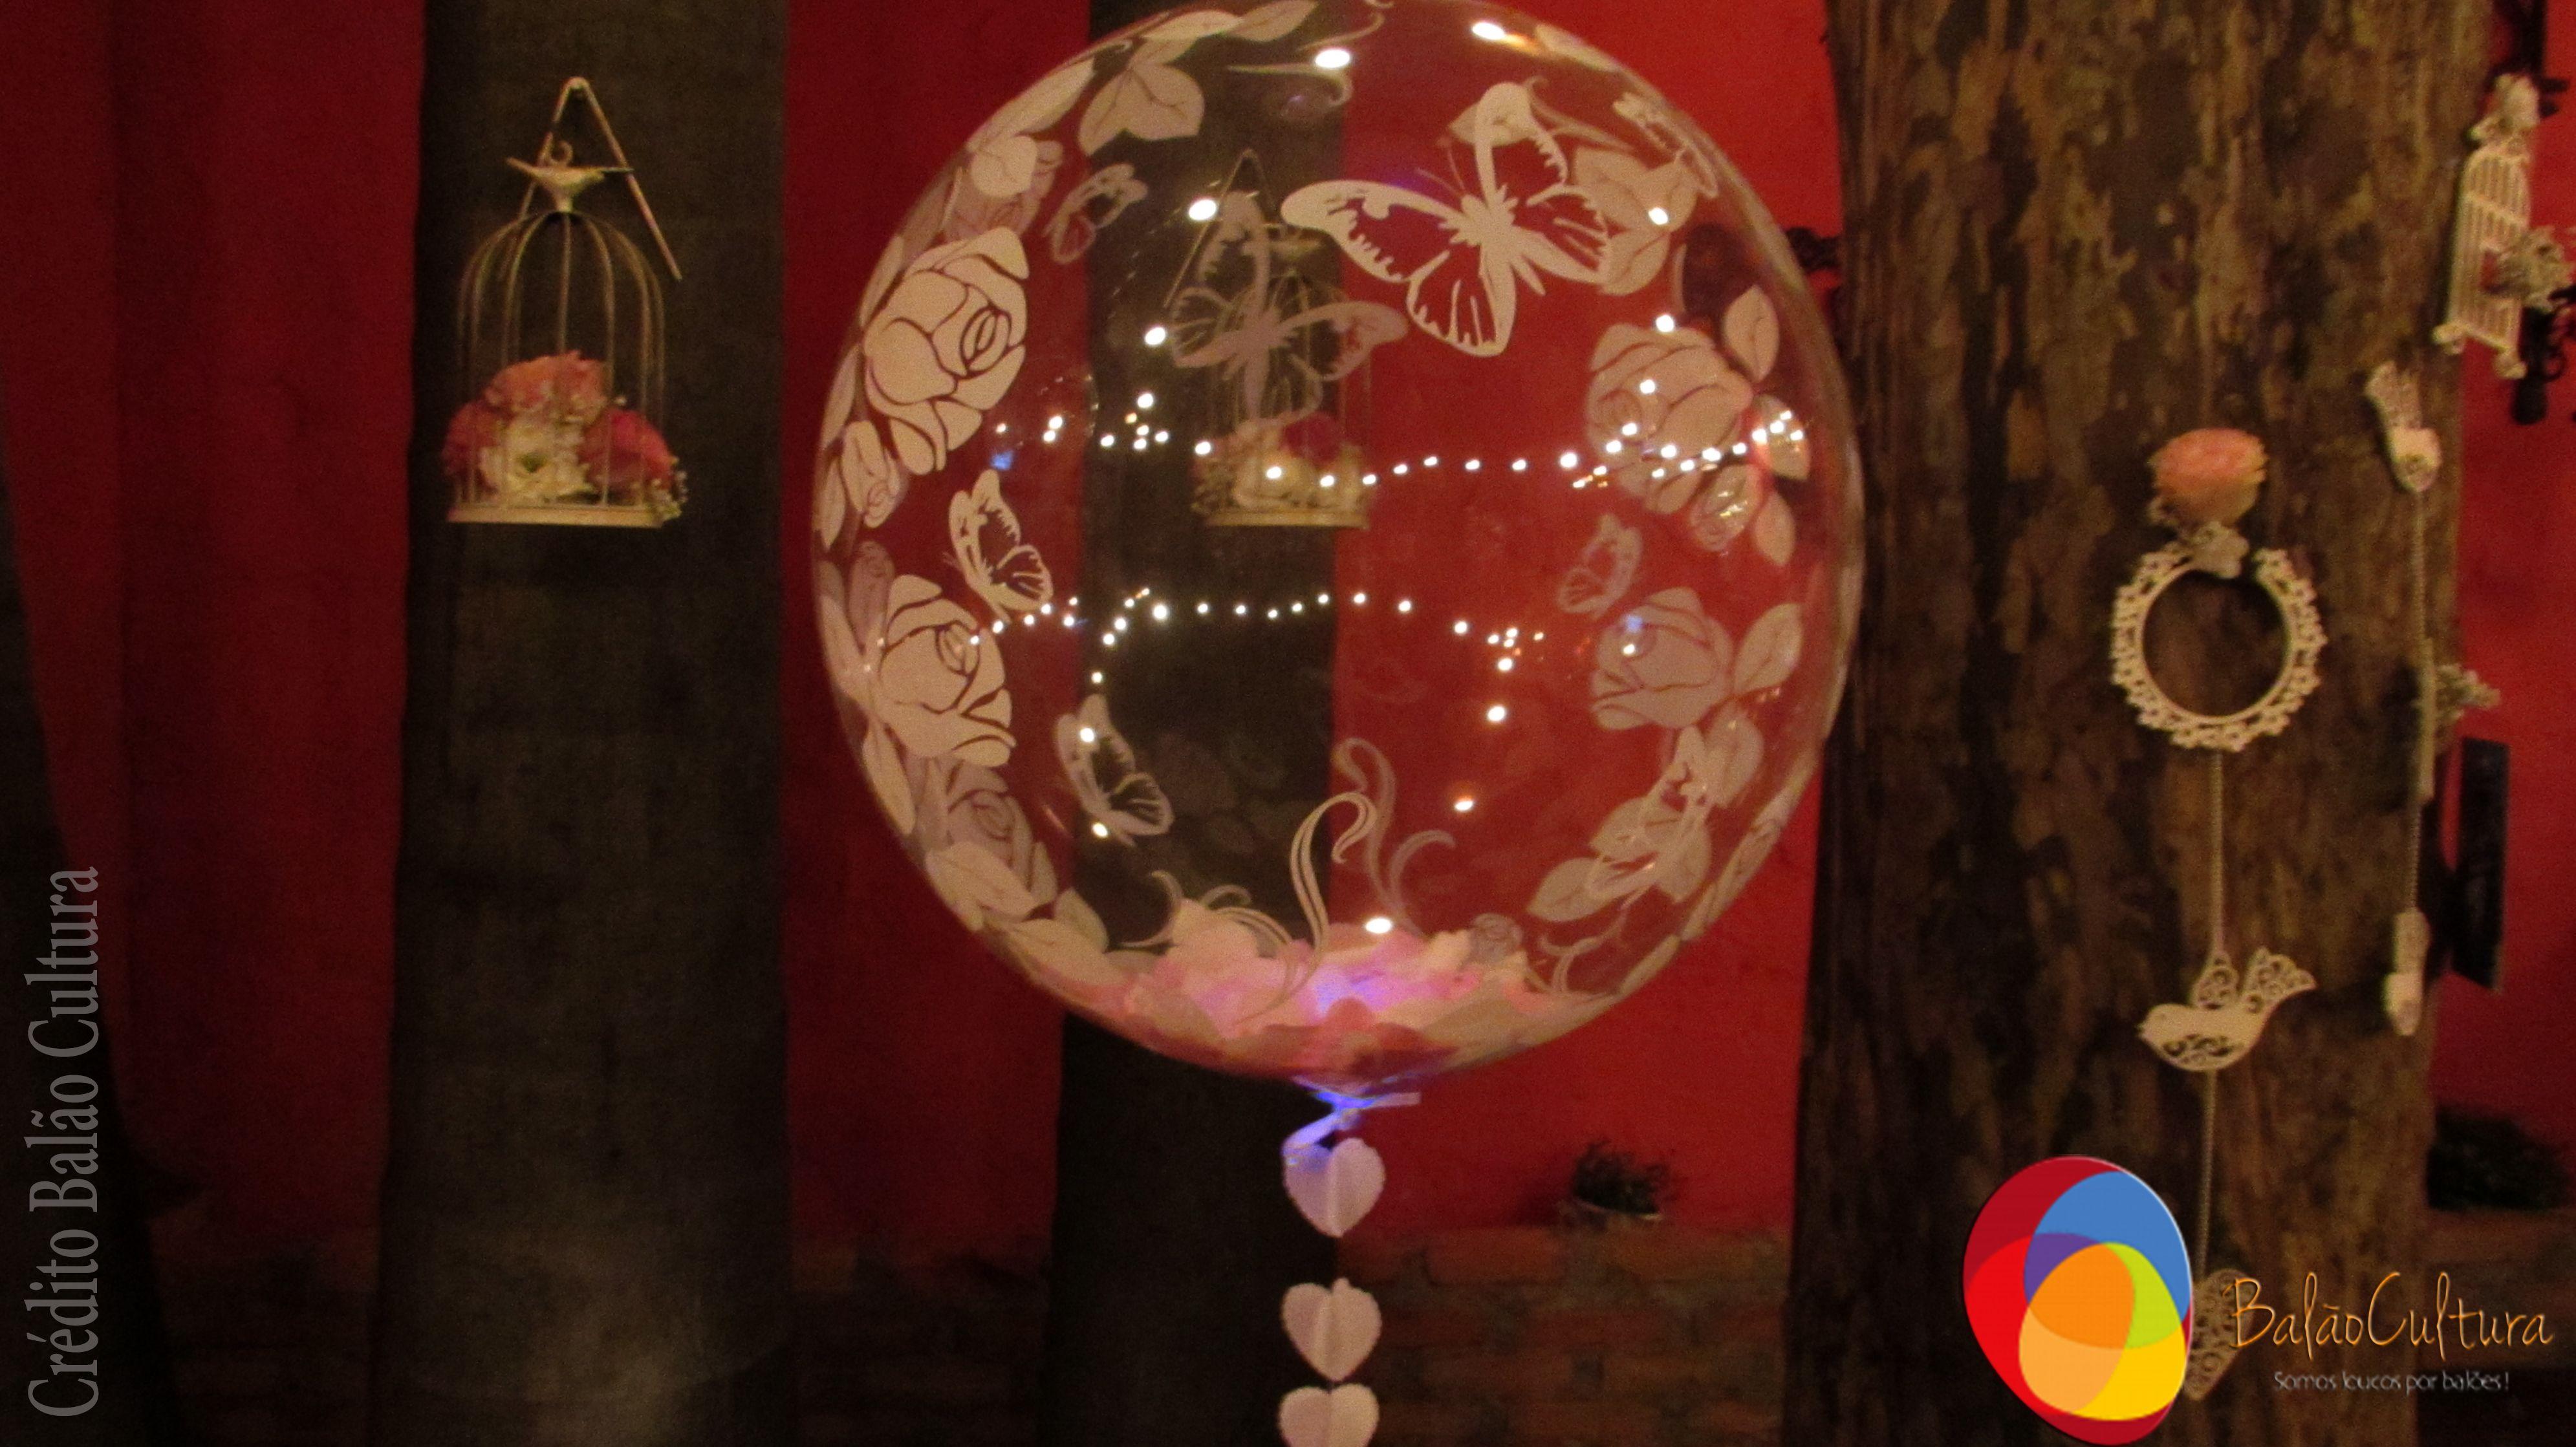 No Espaco Externo Foram Colocados Baloes Bubble Flores E